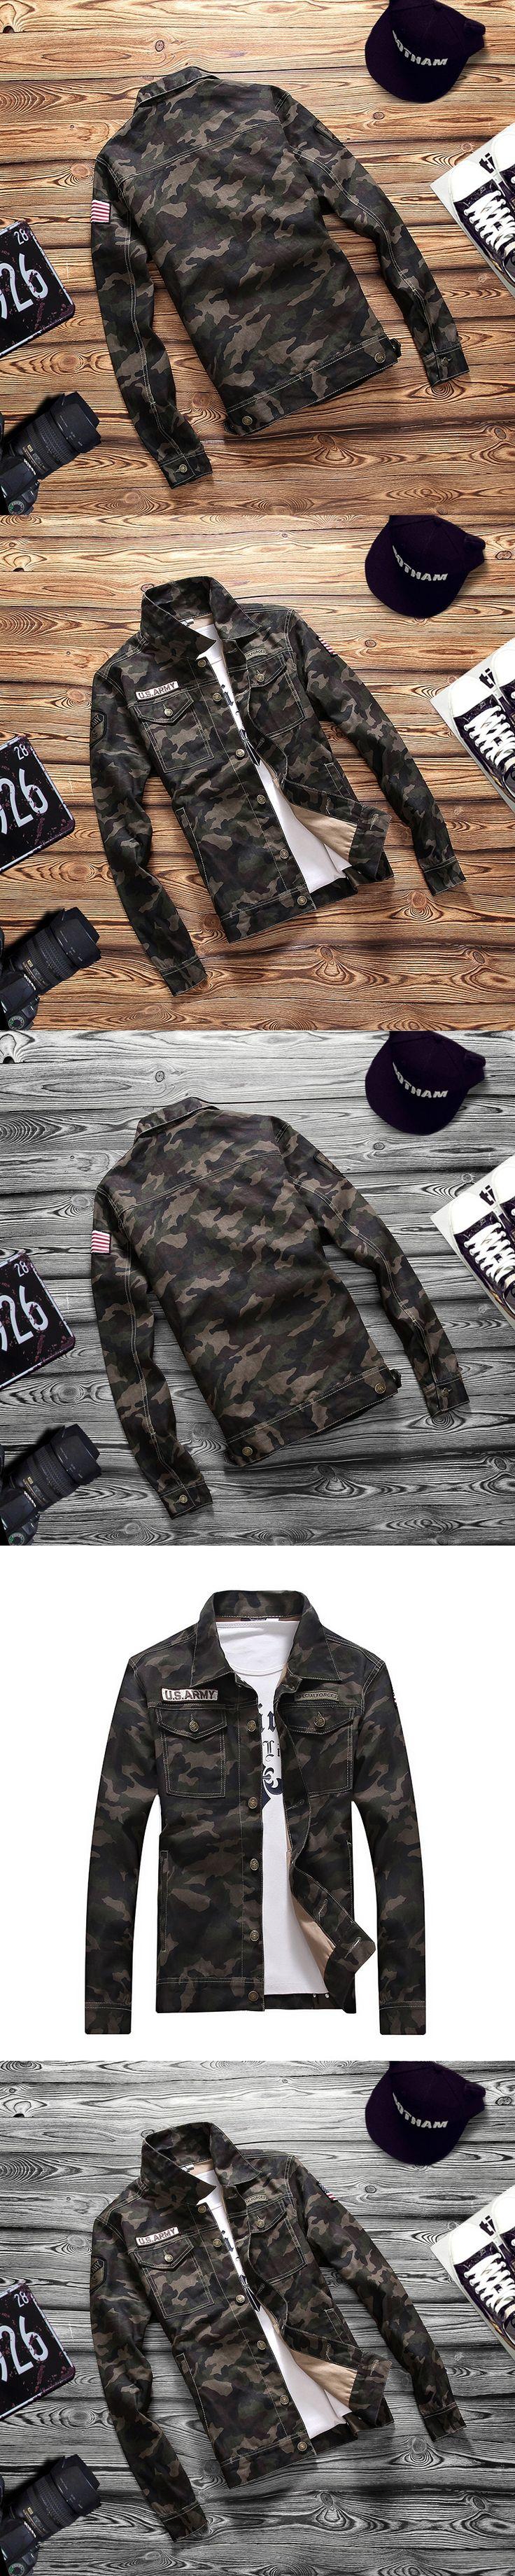 Fashion Outerwear & Coats 2017 Spring men's denim jacket camouflage windbreaker mens Slim Coats jaqueta masculina male Plus 4XL